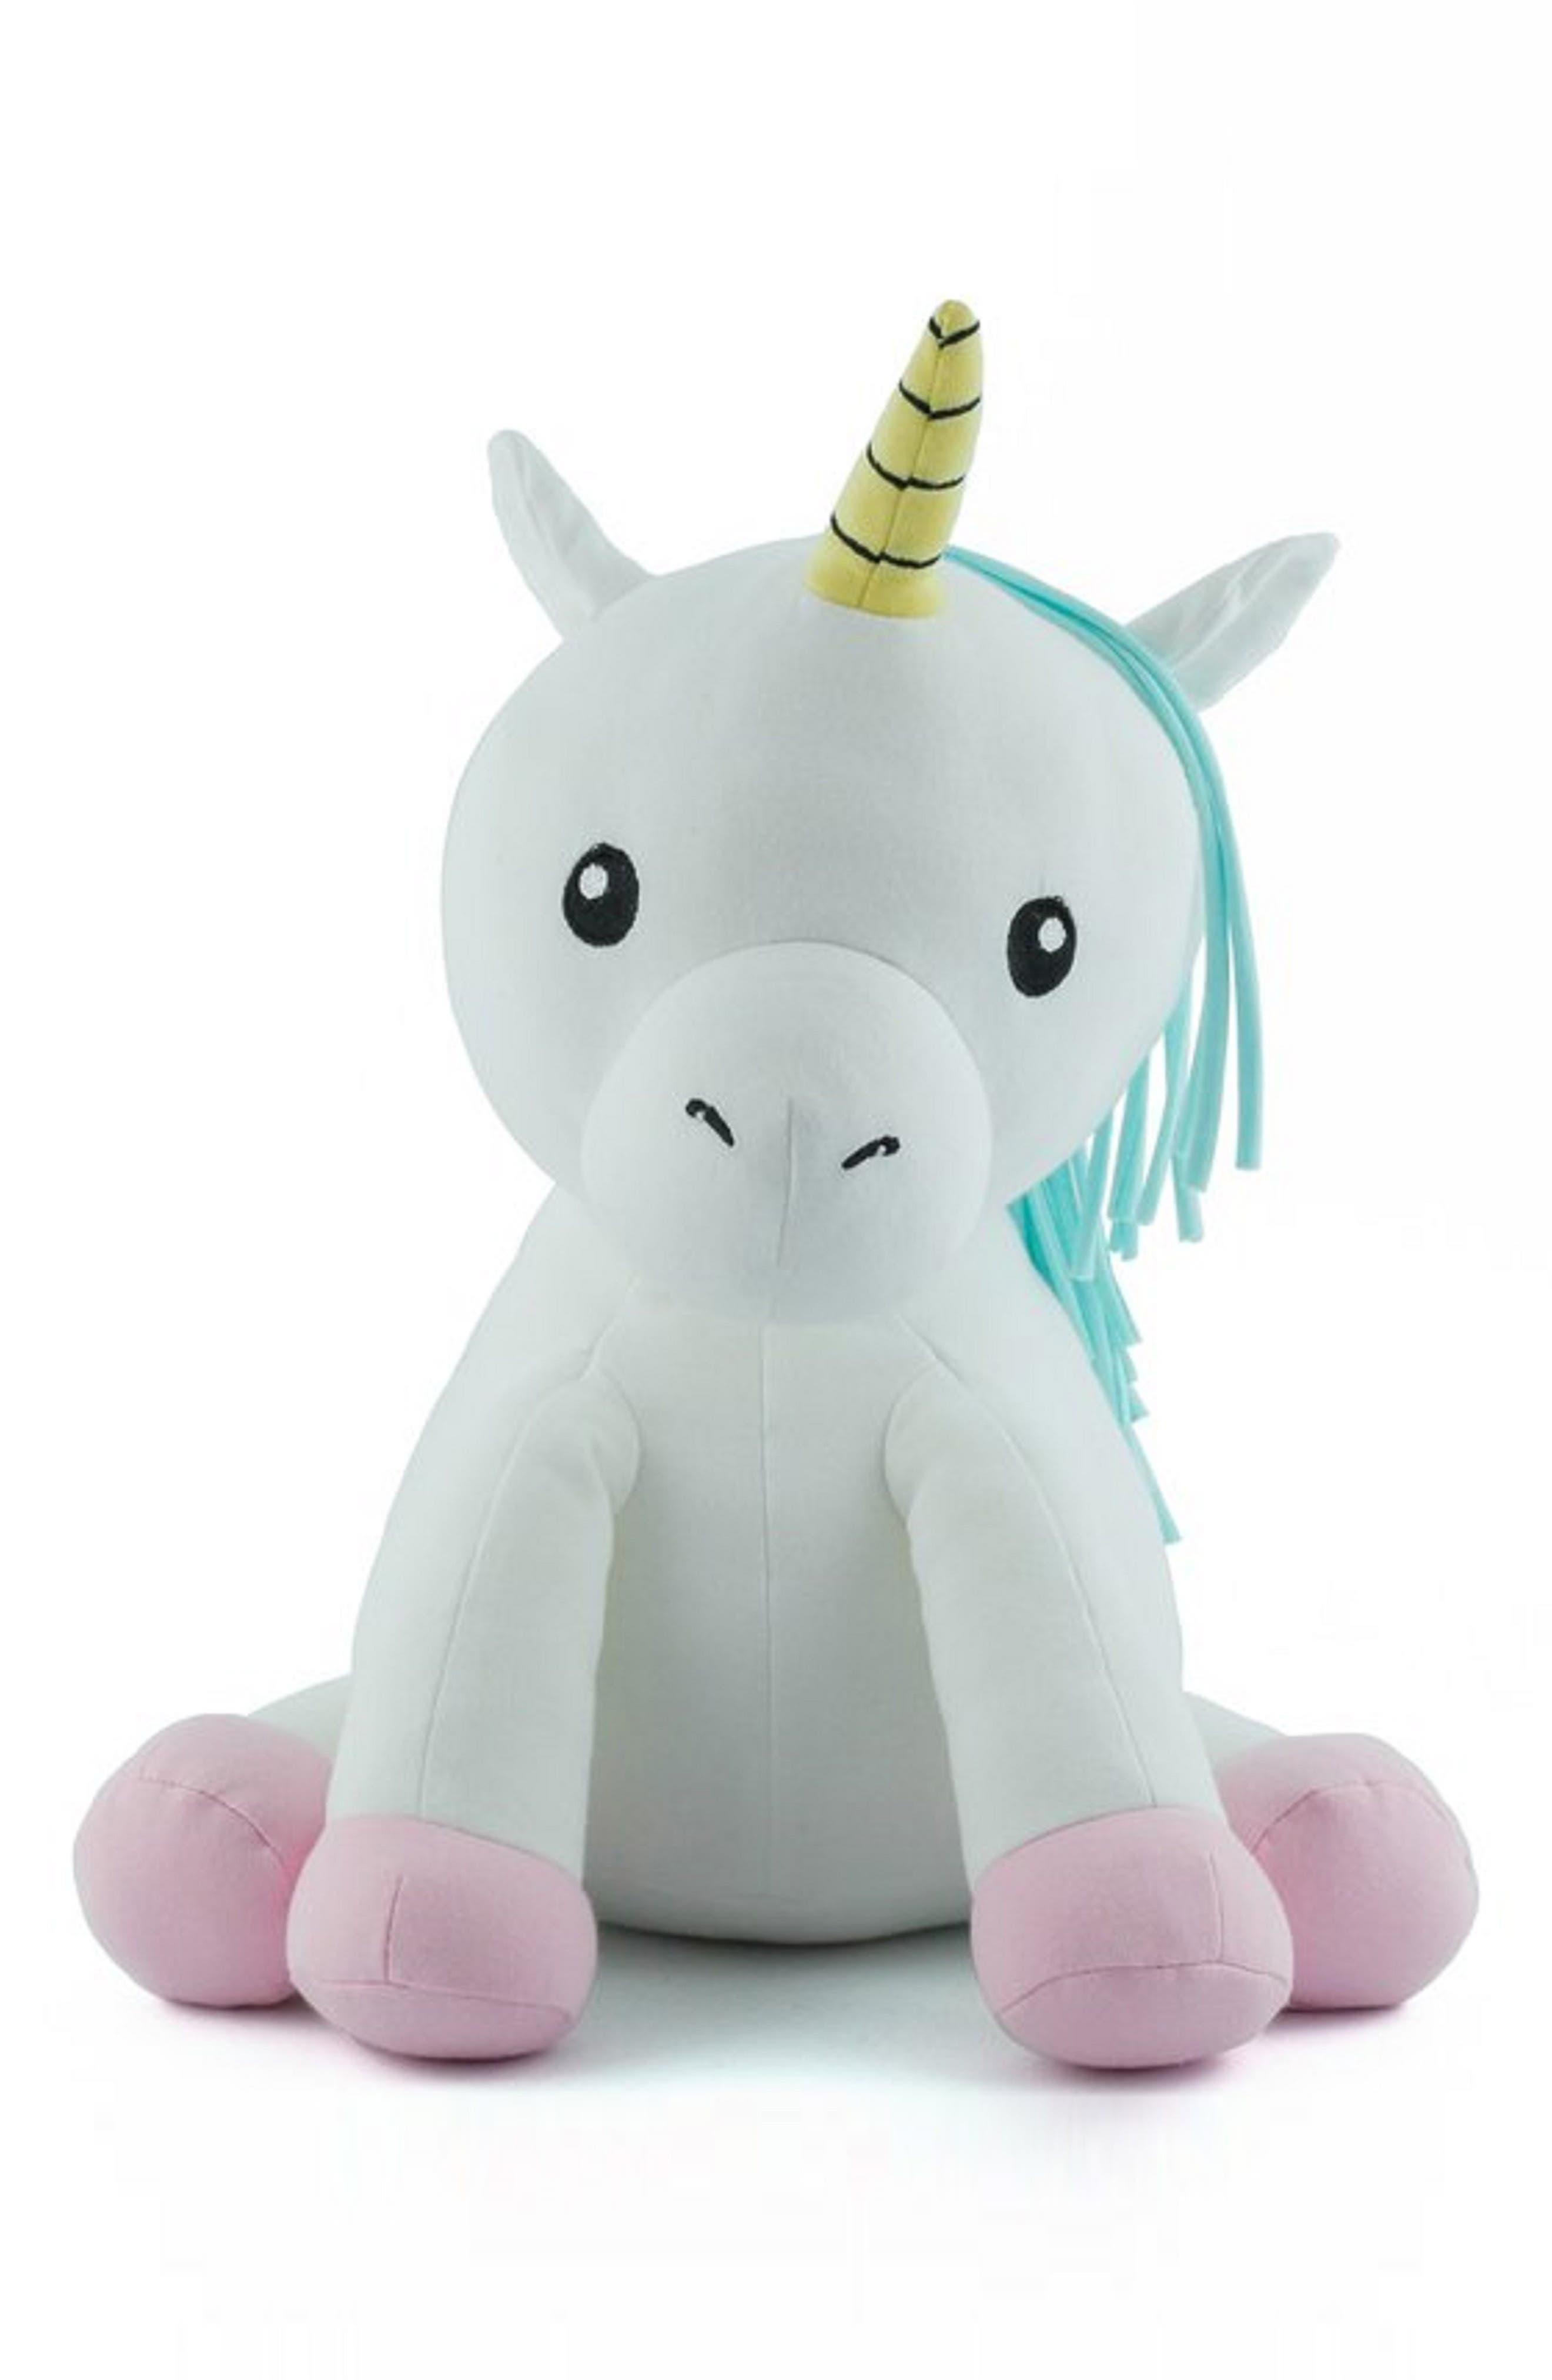 Elly Lu Organics Cupcake Unicorn Stuffed Animal